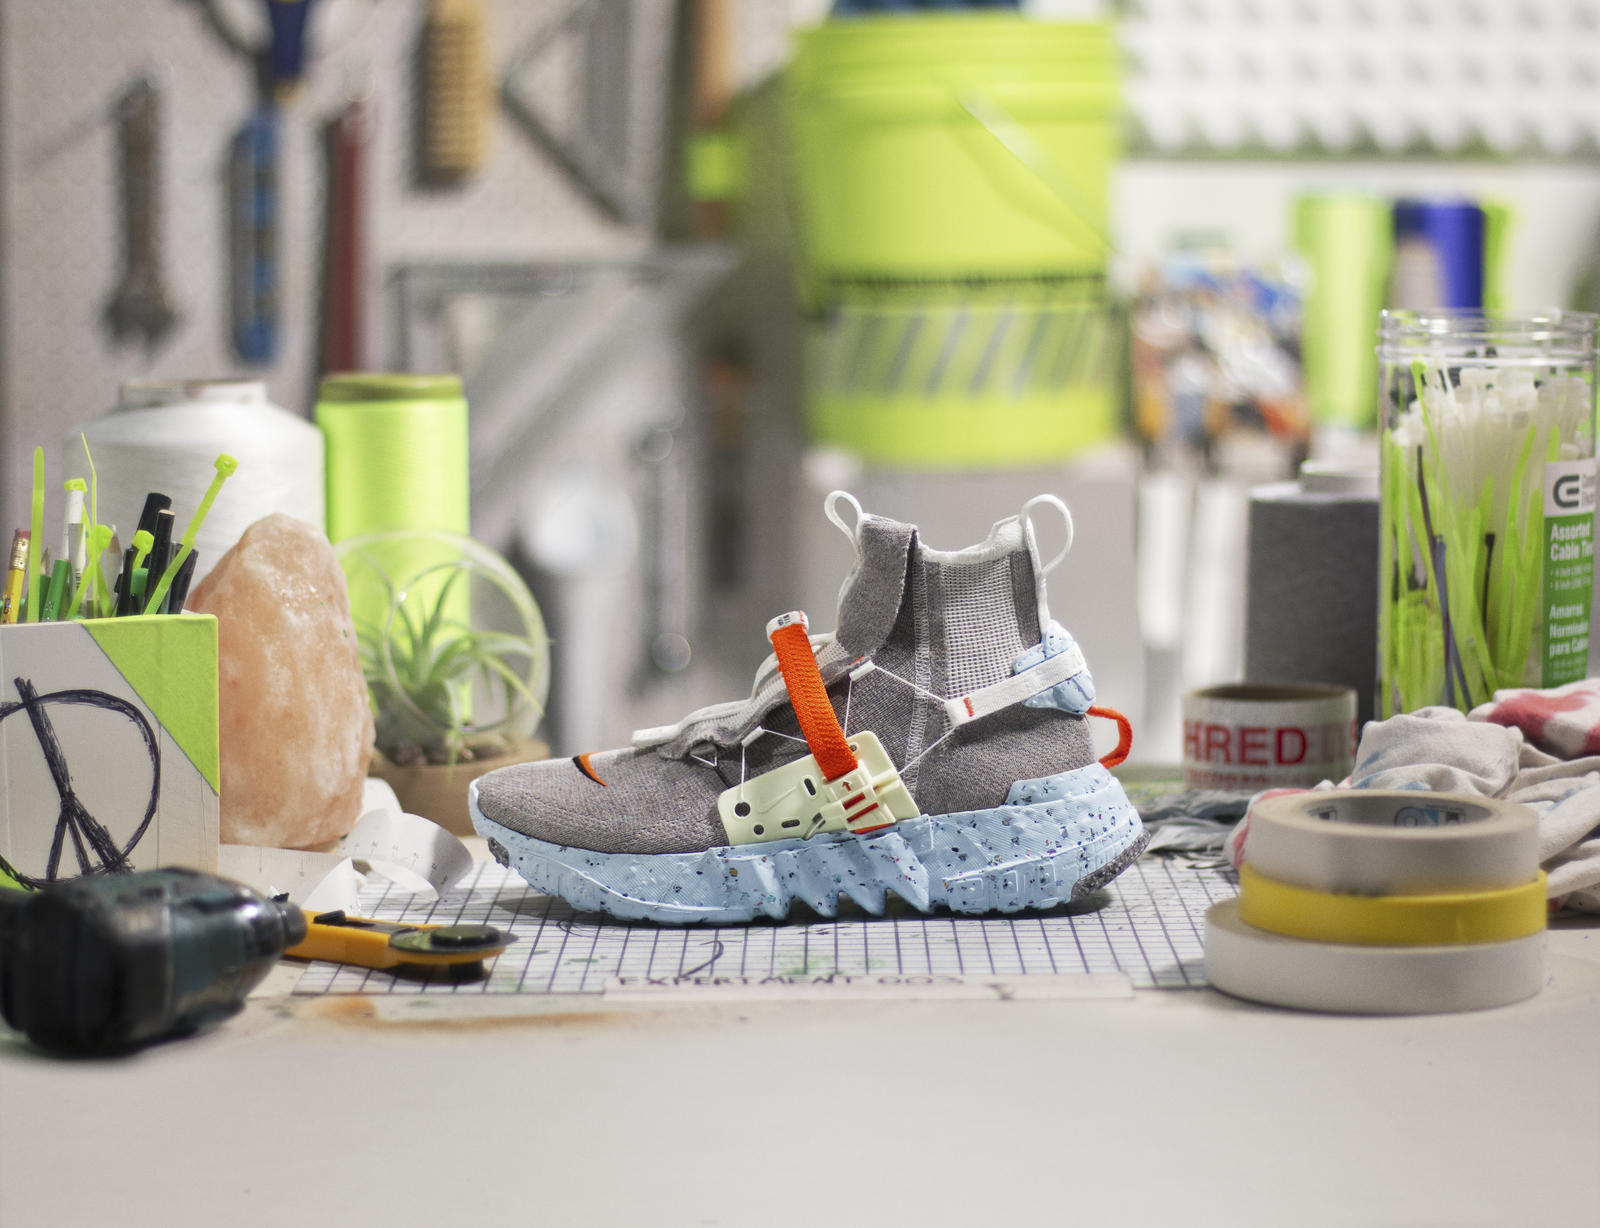 Nike、リサイクル素材を用いた新作フットウェアコレクション発売